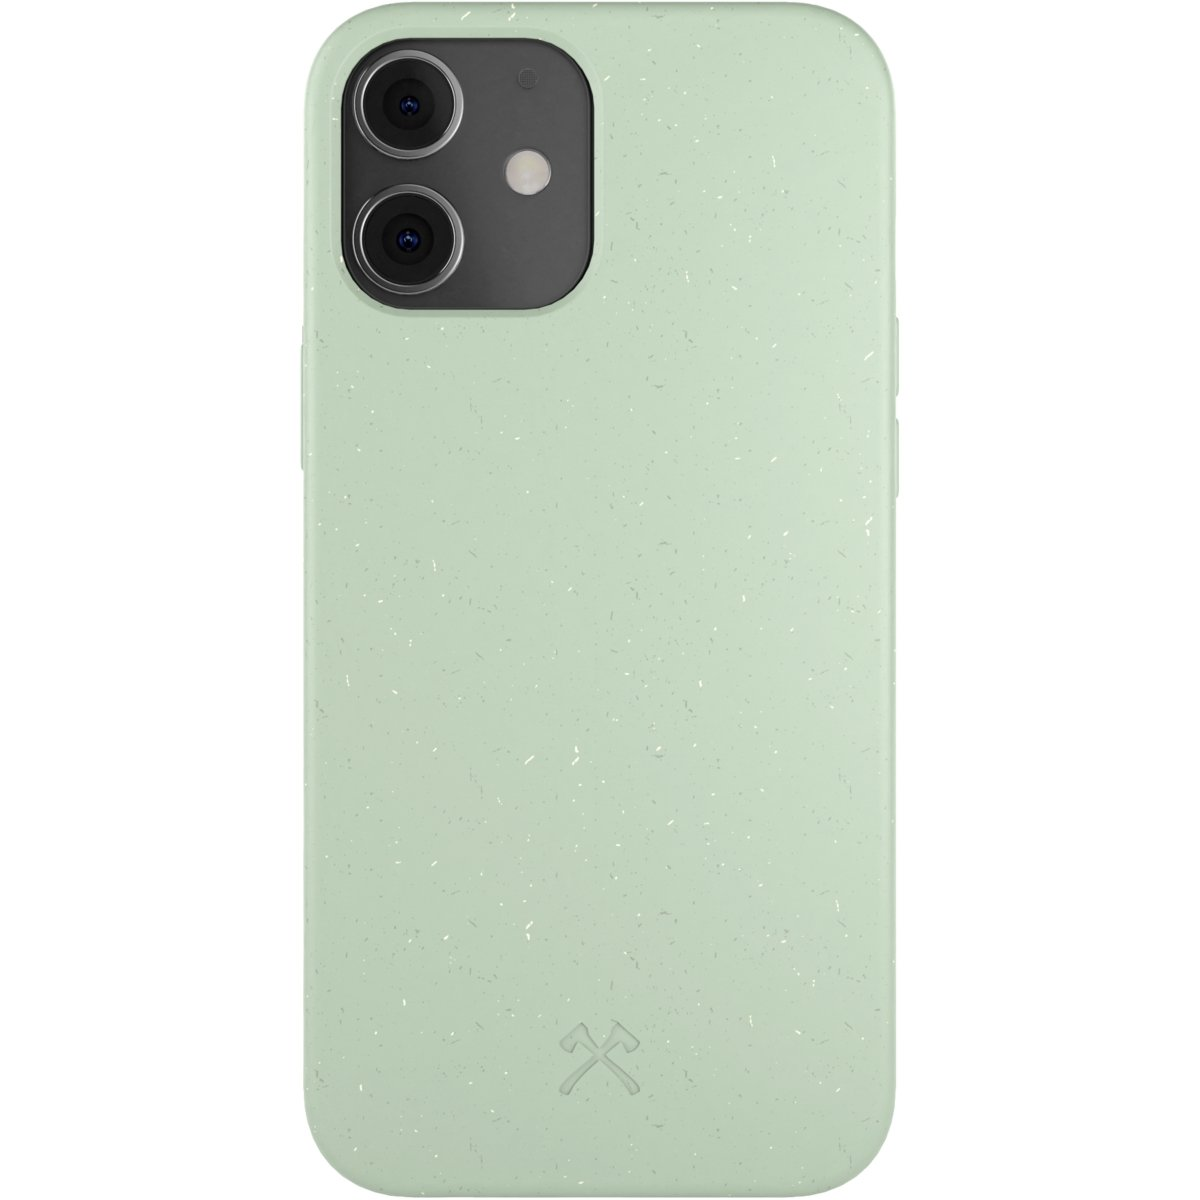 Woodcessories Bio Case AM iPhone 12 Mini - mint